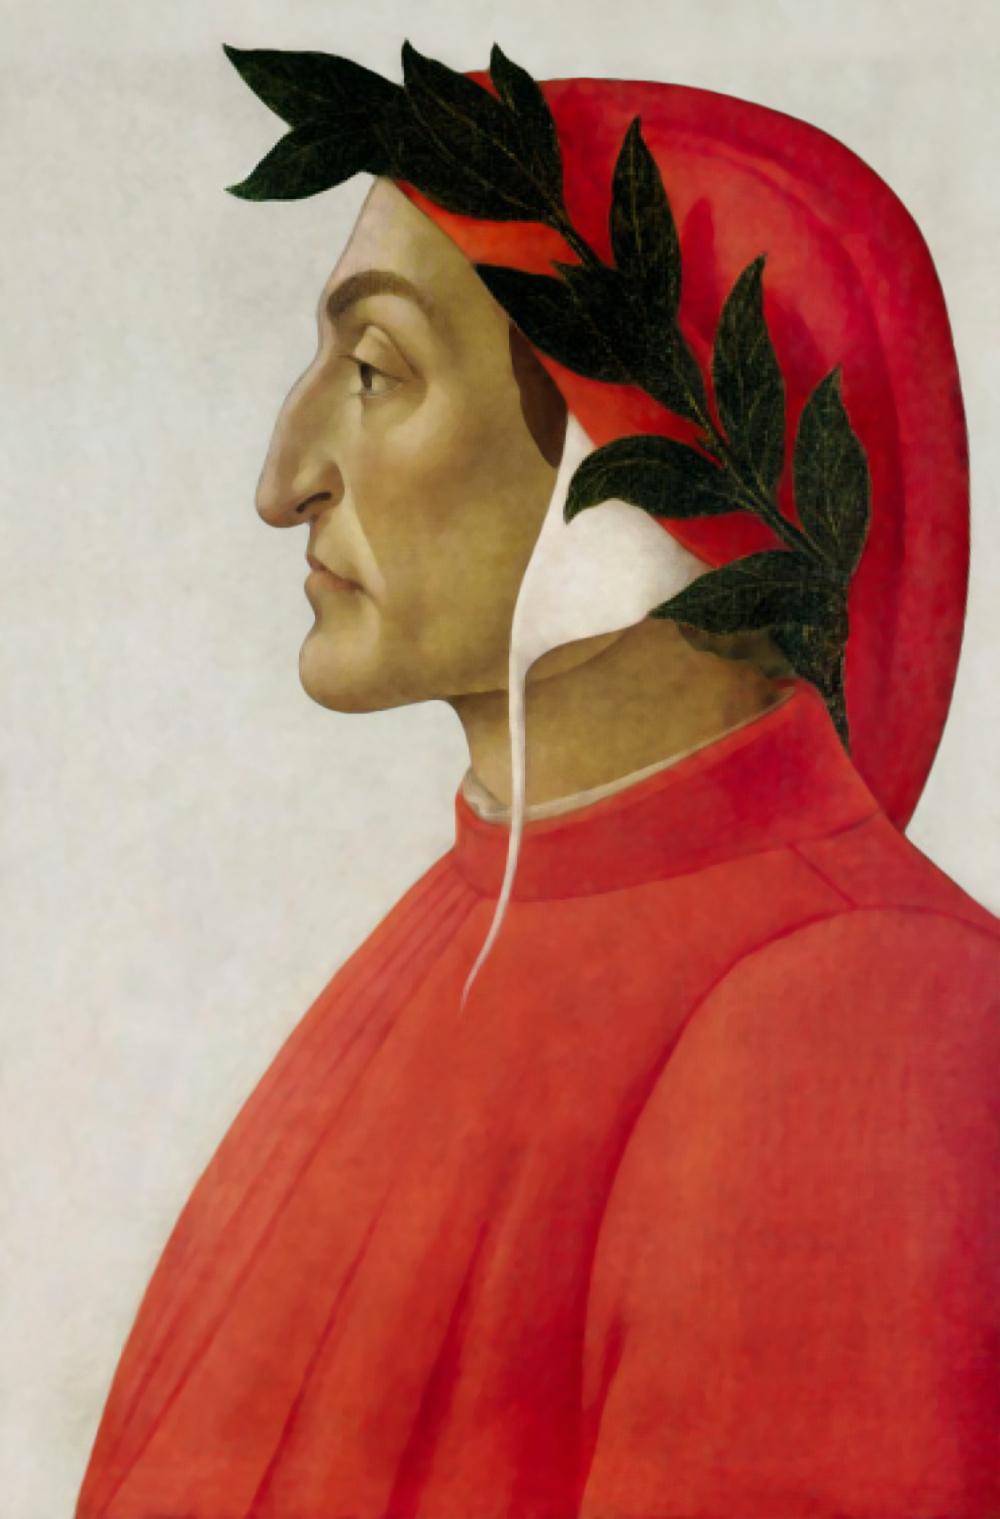 Depiction of Dante Alighieri